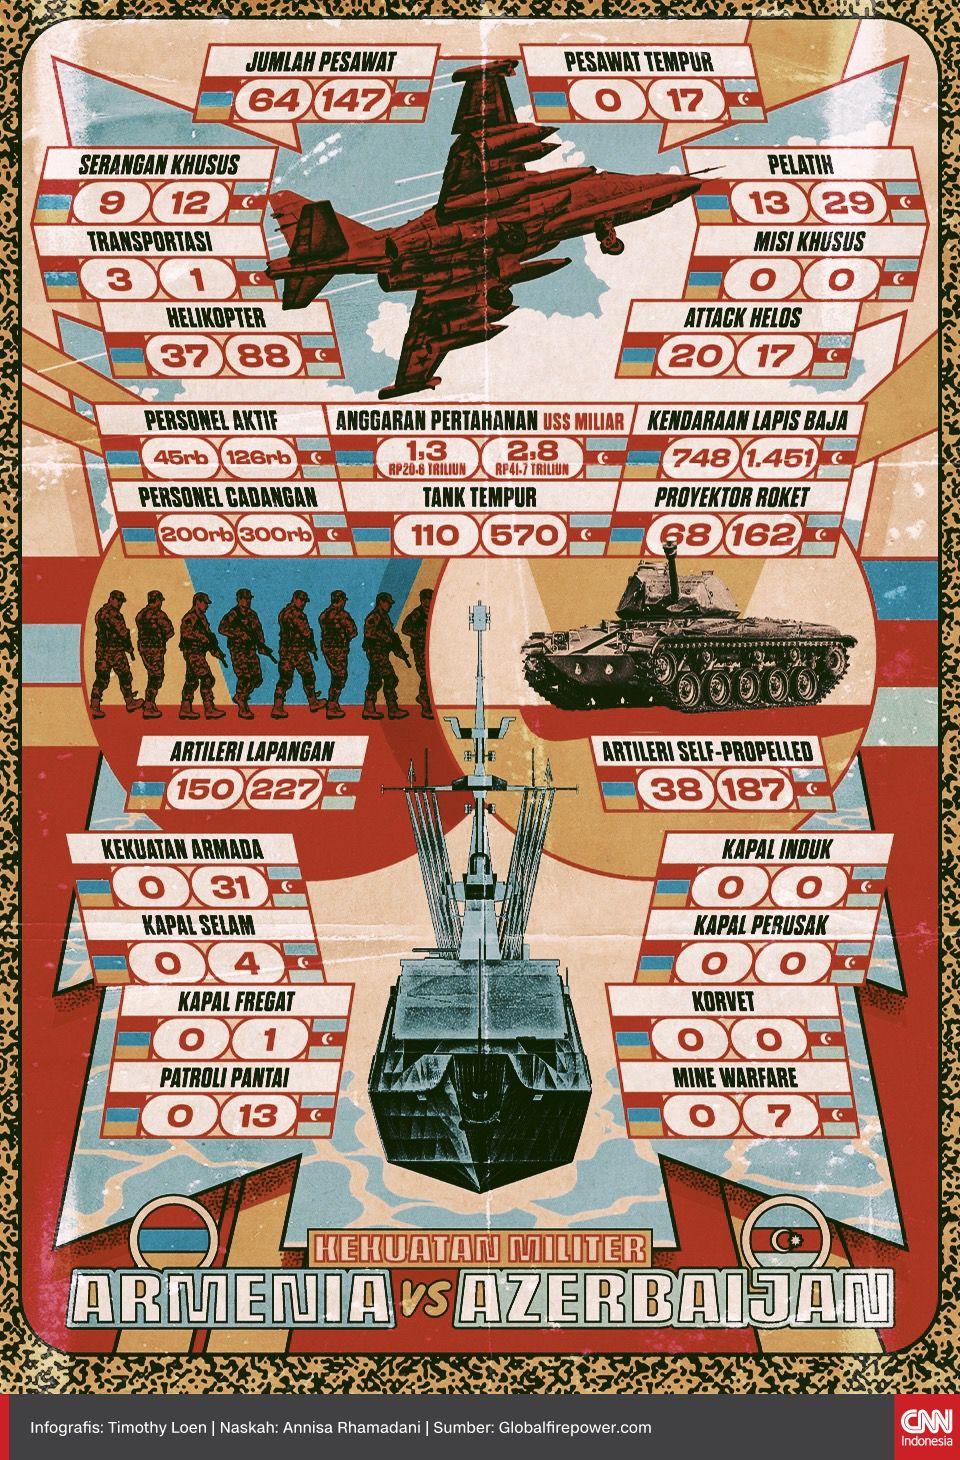 Infografis Perbandingan Militer Armenia-Azerbaijan